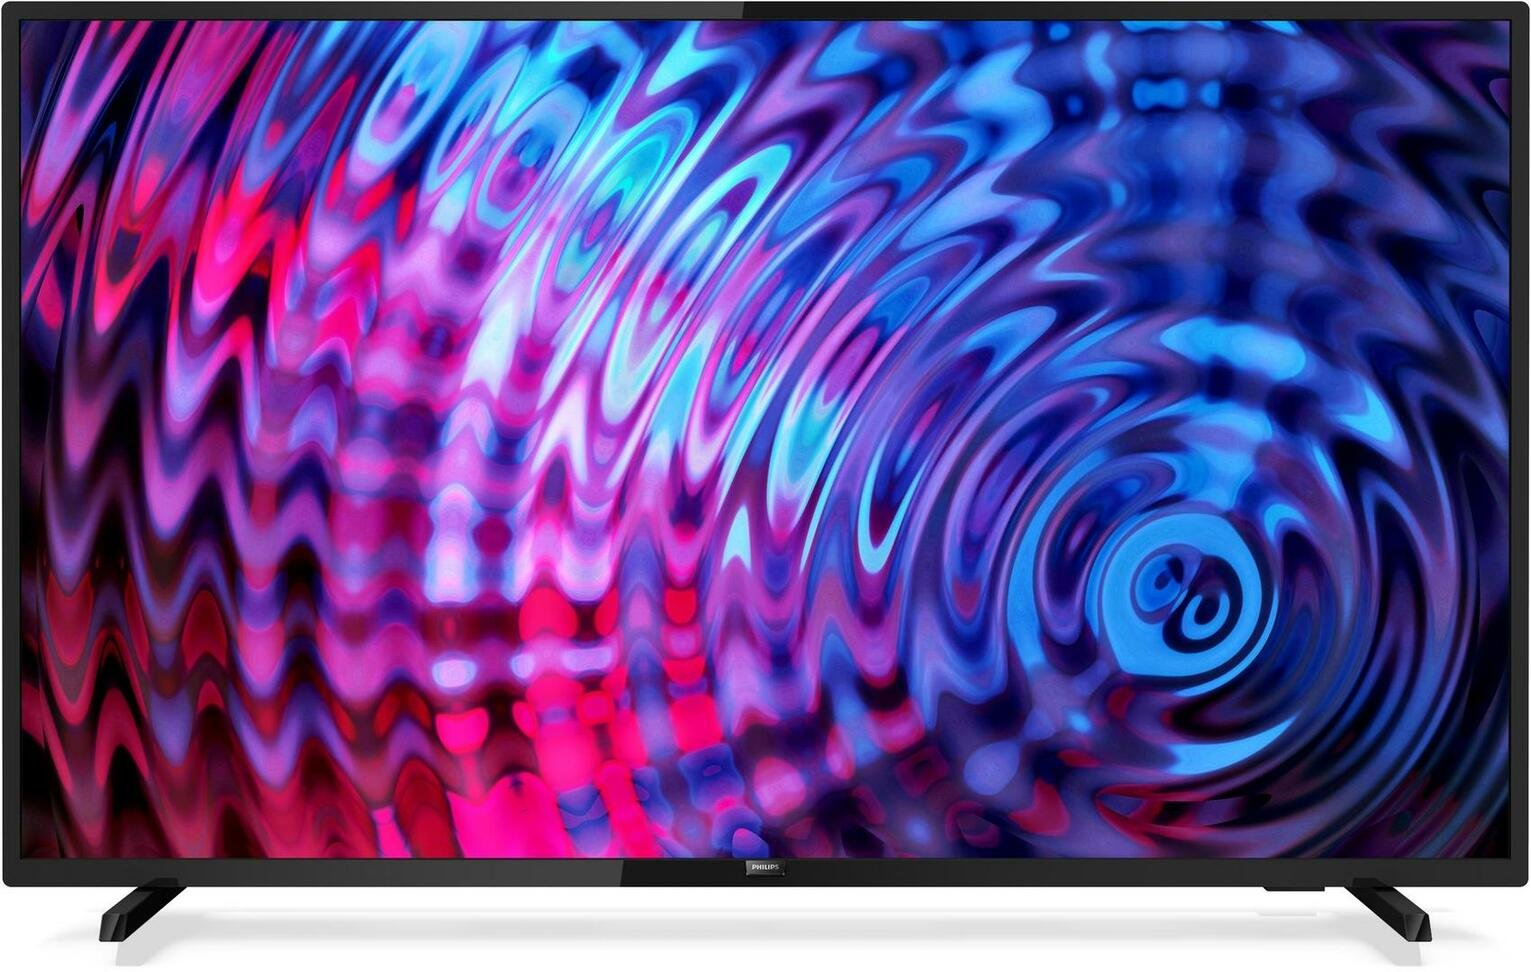 Philips 43 Inch 43PFT5503 Full HD TV